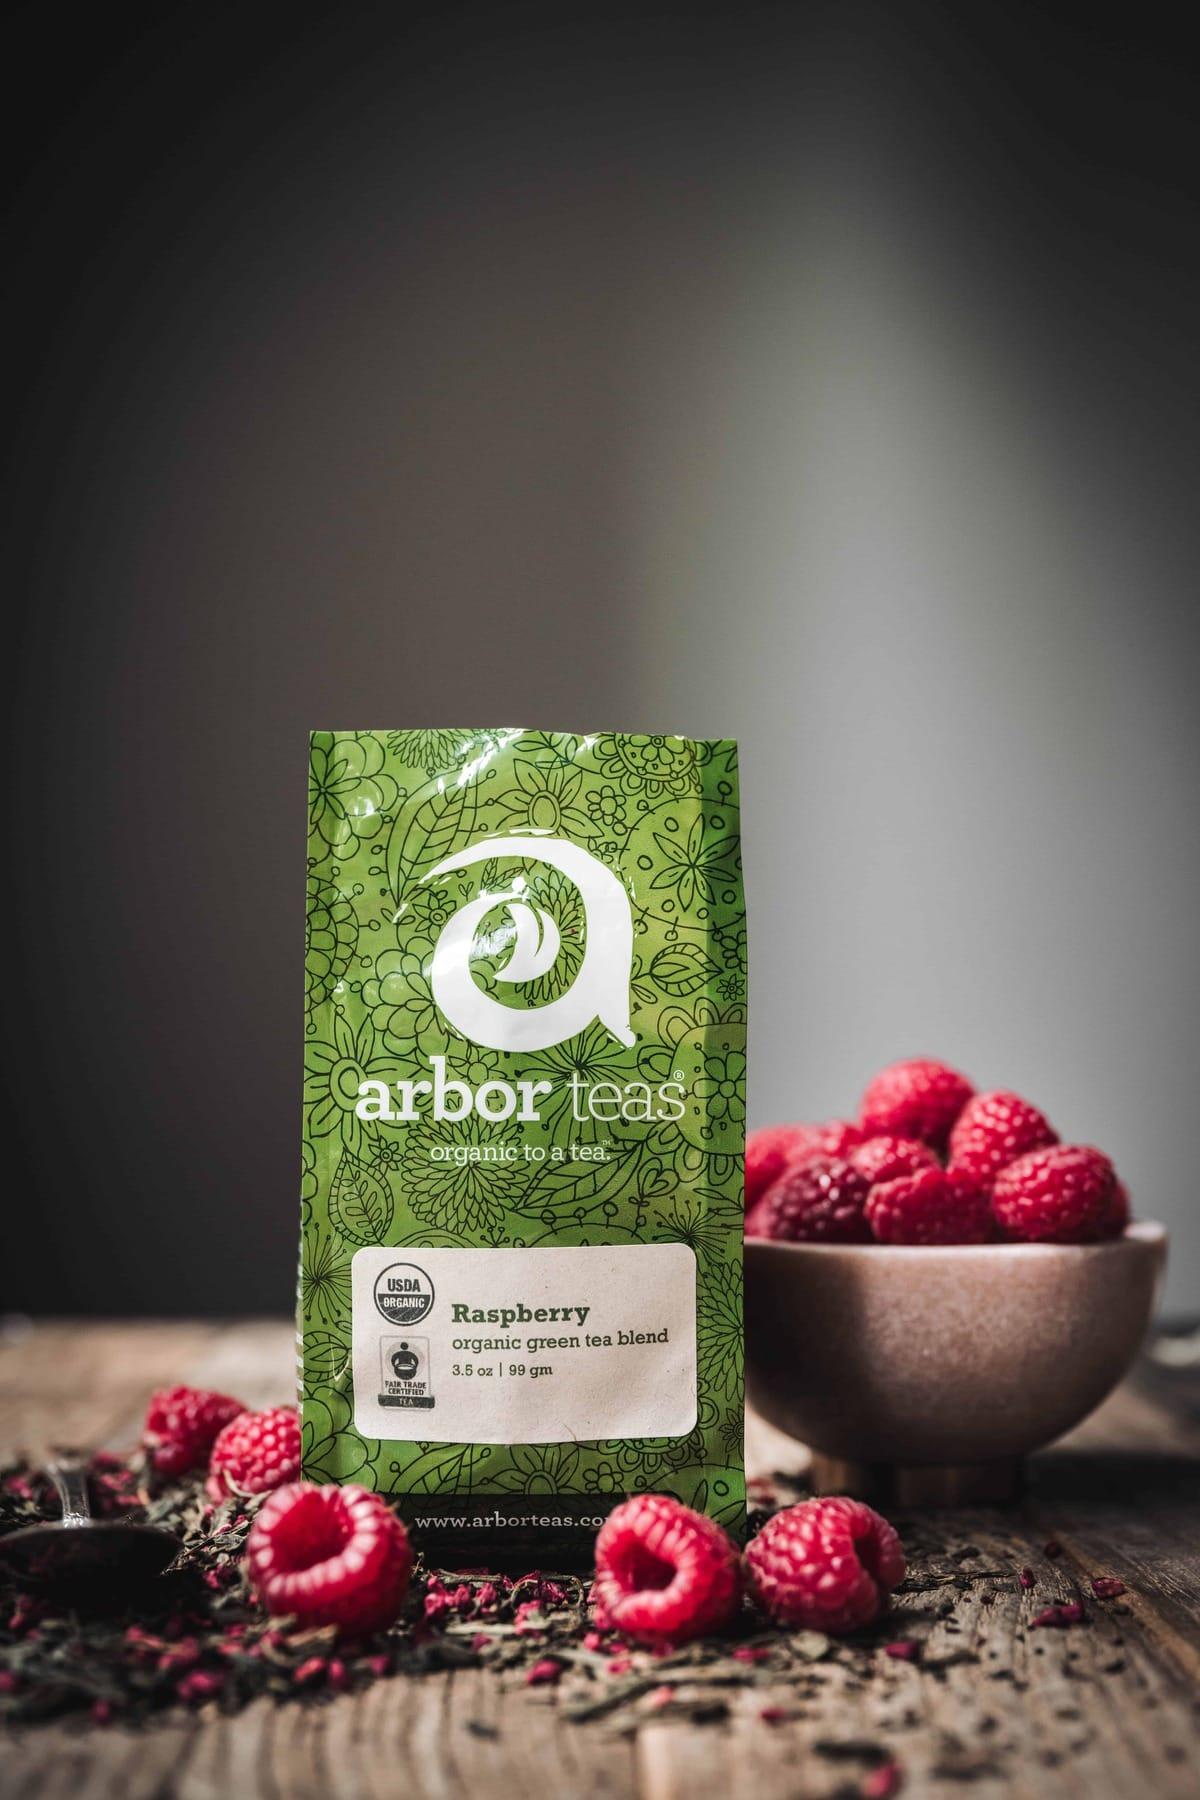 Side view of Arbor Teas Raspberry Green Tea